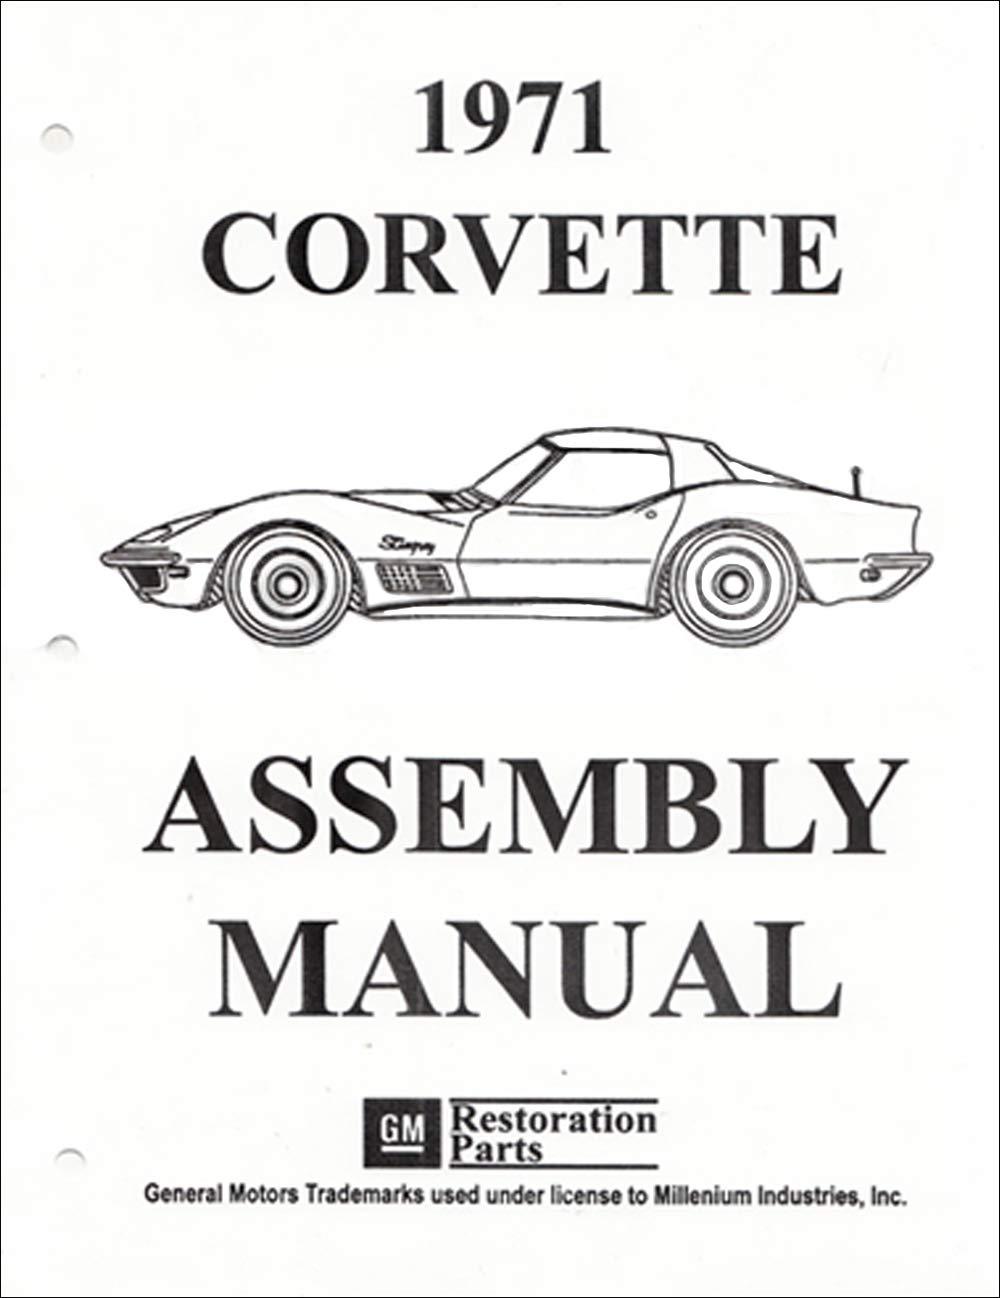 1973 Corvette Reprint Factory Assembly Manual Corvette Gm Chevy Chevrolet Corvette Gm Chevy Chevrolet Corvette Gm Chevy Chevrolet Corvette Gm Chevy Chevrolet Corvette Gm Chevy Chevrolet Corvette Gm Chevy Chevrolet Corvette Gm